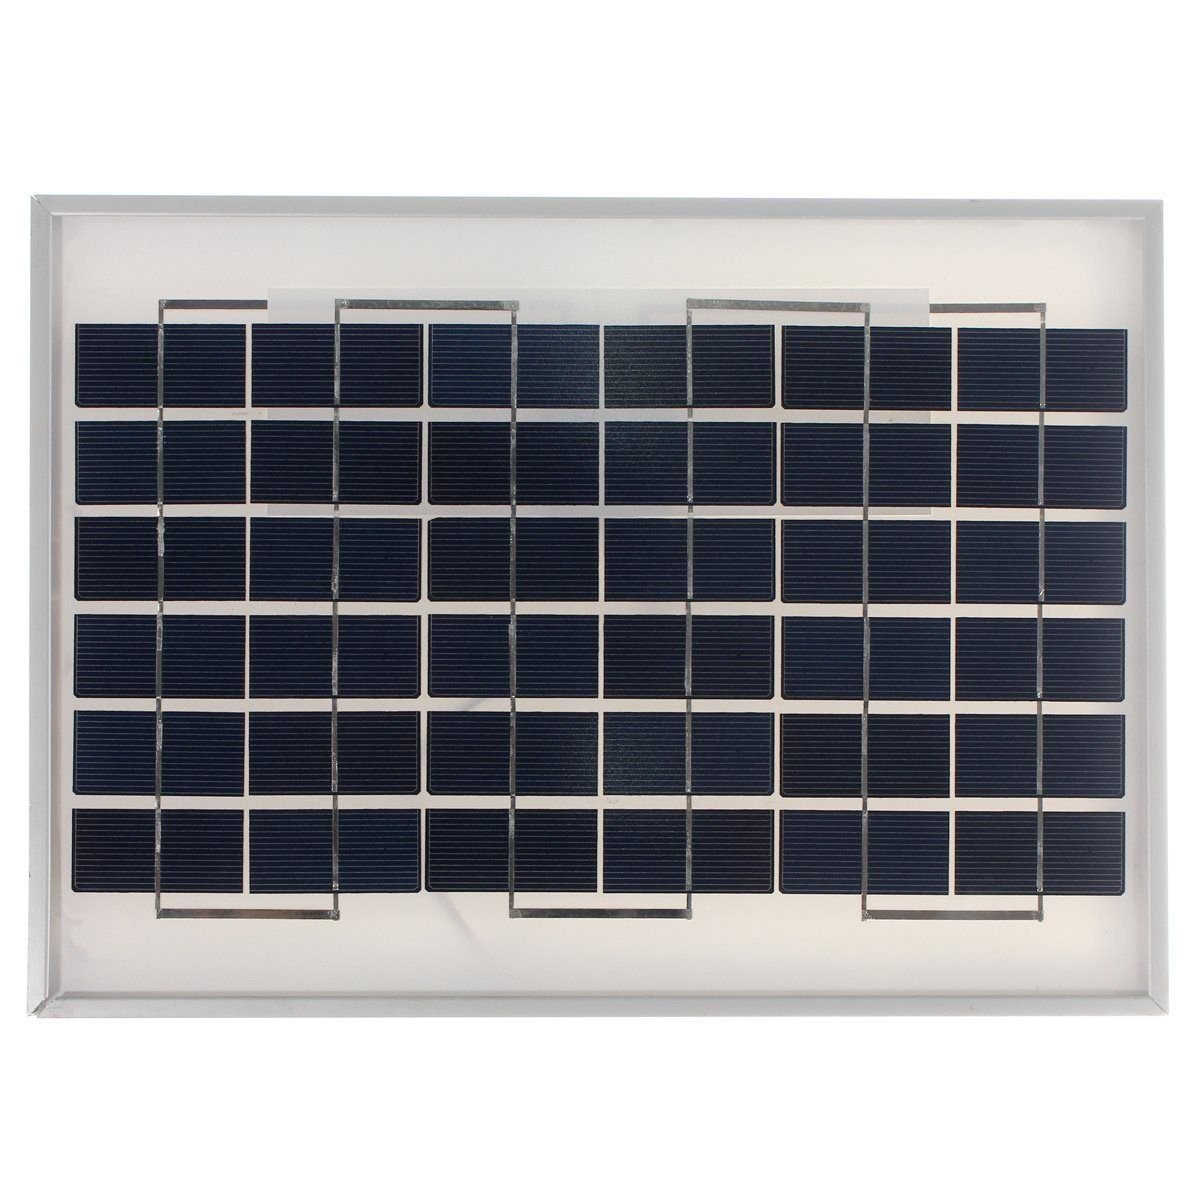 GTO Mighty Mule 20W 18V PolyCrystalline Full Kit Solar Panel Gate Door Operators